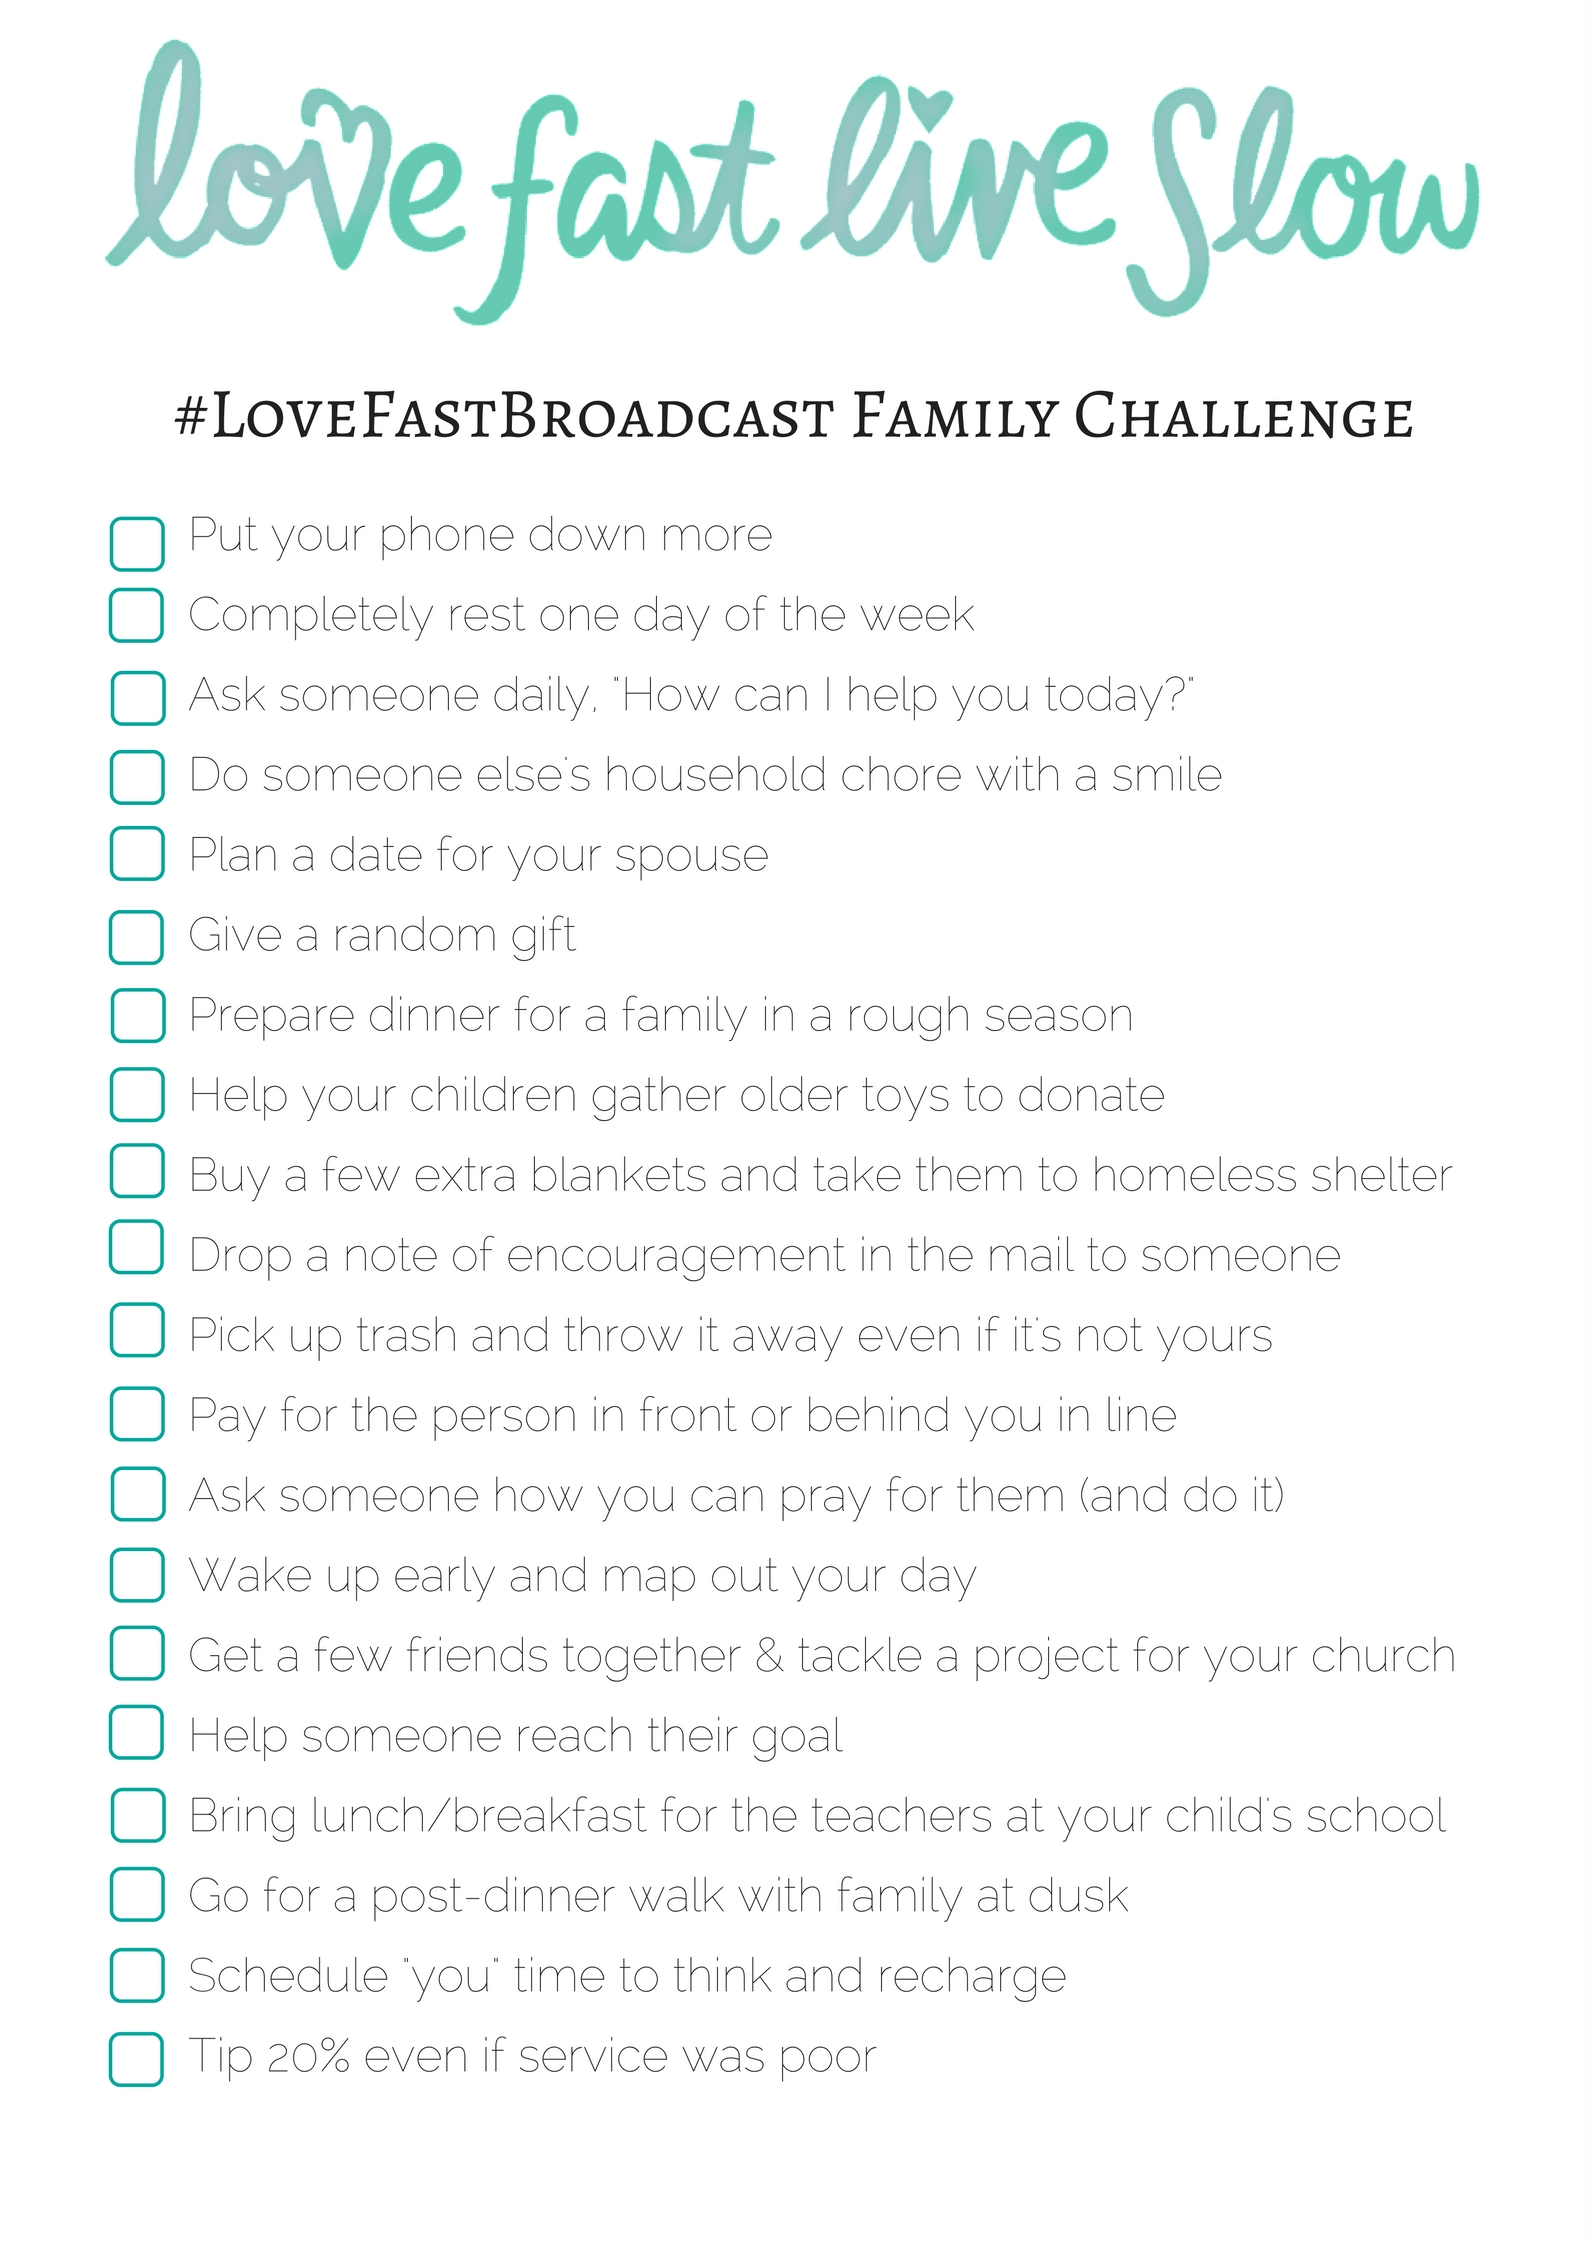 Family Checklist.jpg